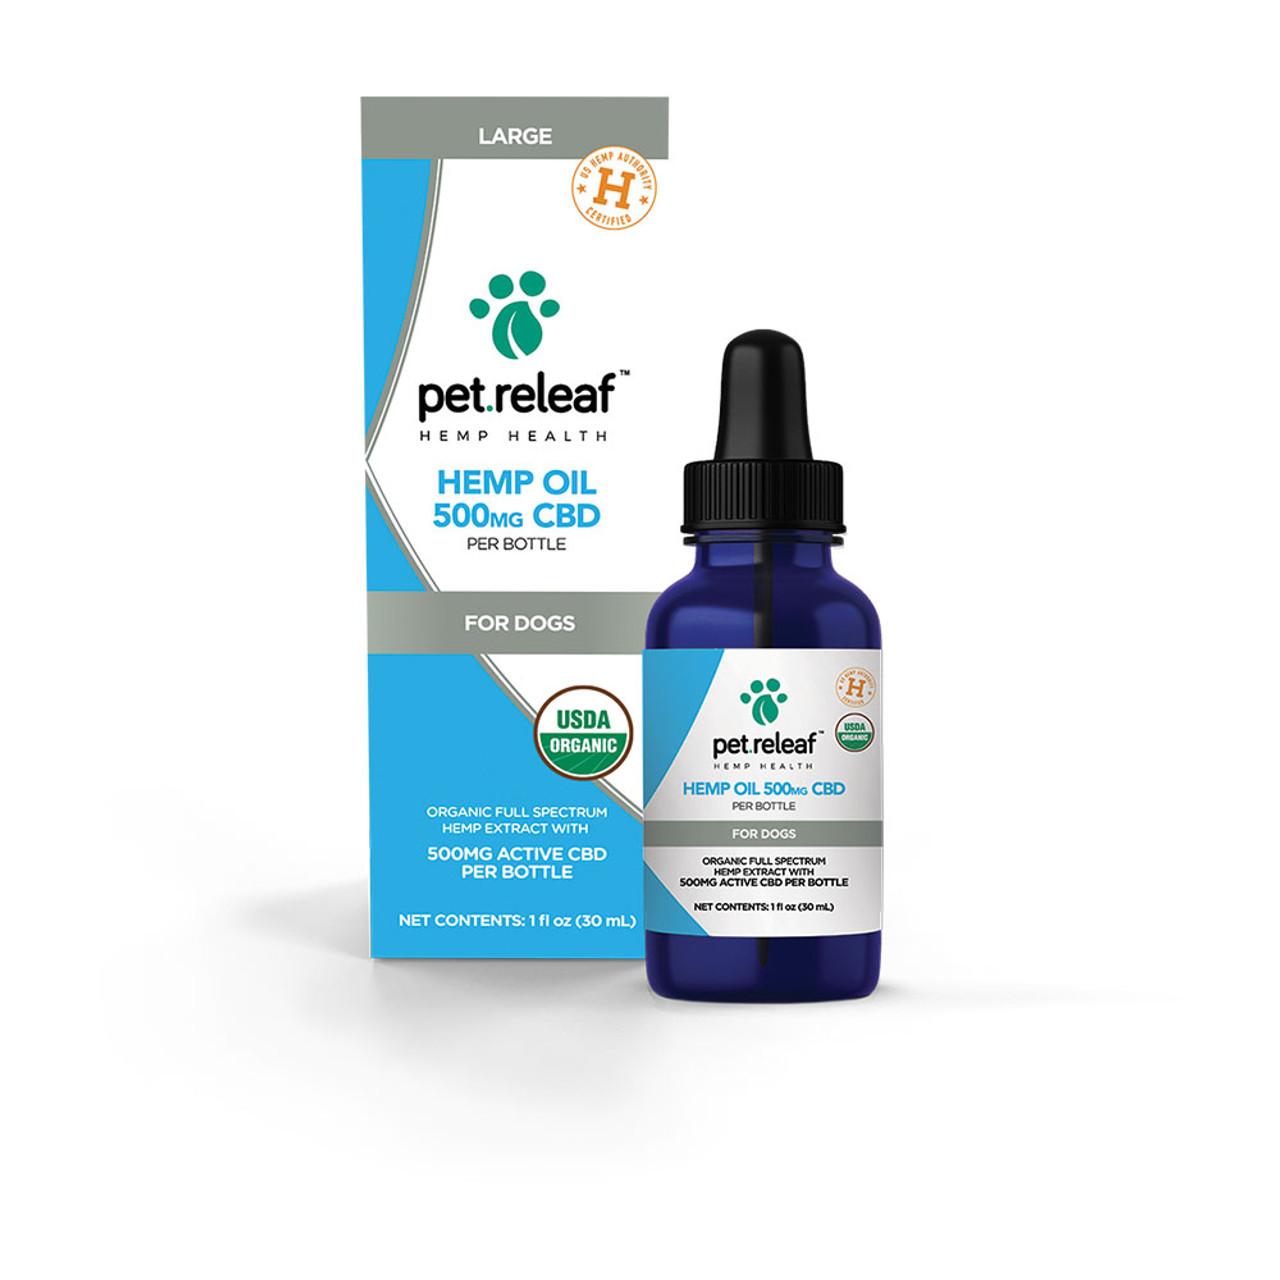 Pet Releaf Organic Full Spectrum Hemp Oil 500mg for Large Dogs - Front